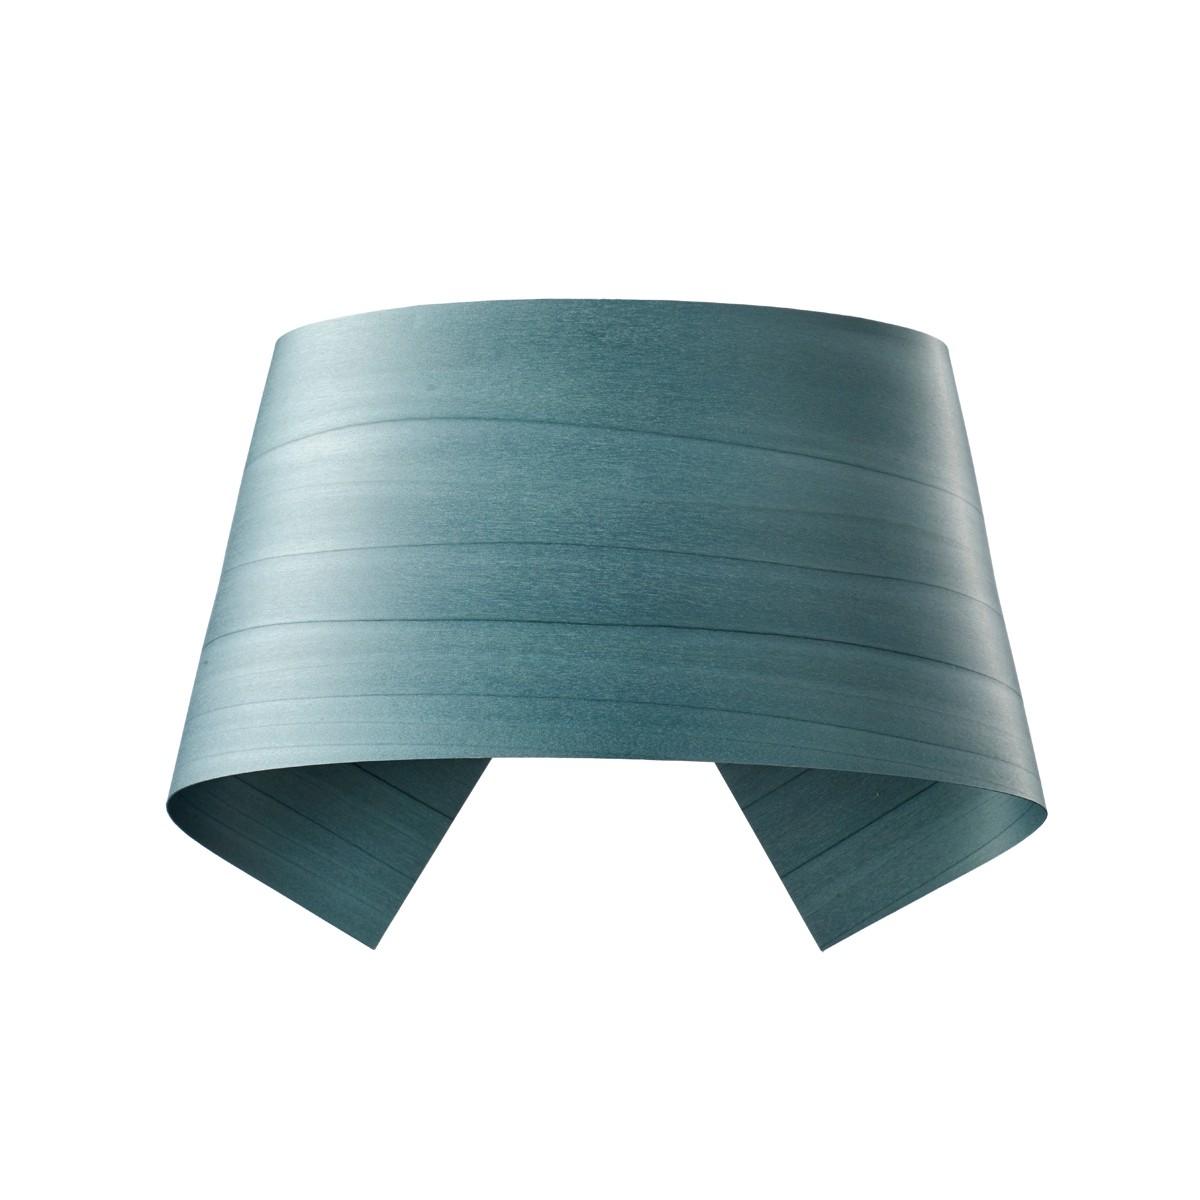 LZF Lamps Hi-Collar LED Wandleuchte, türkis